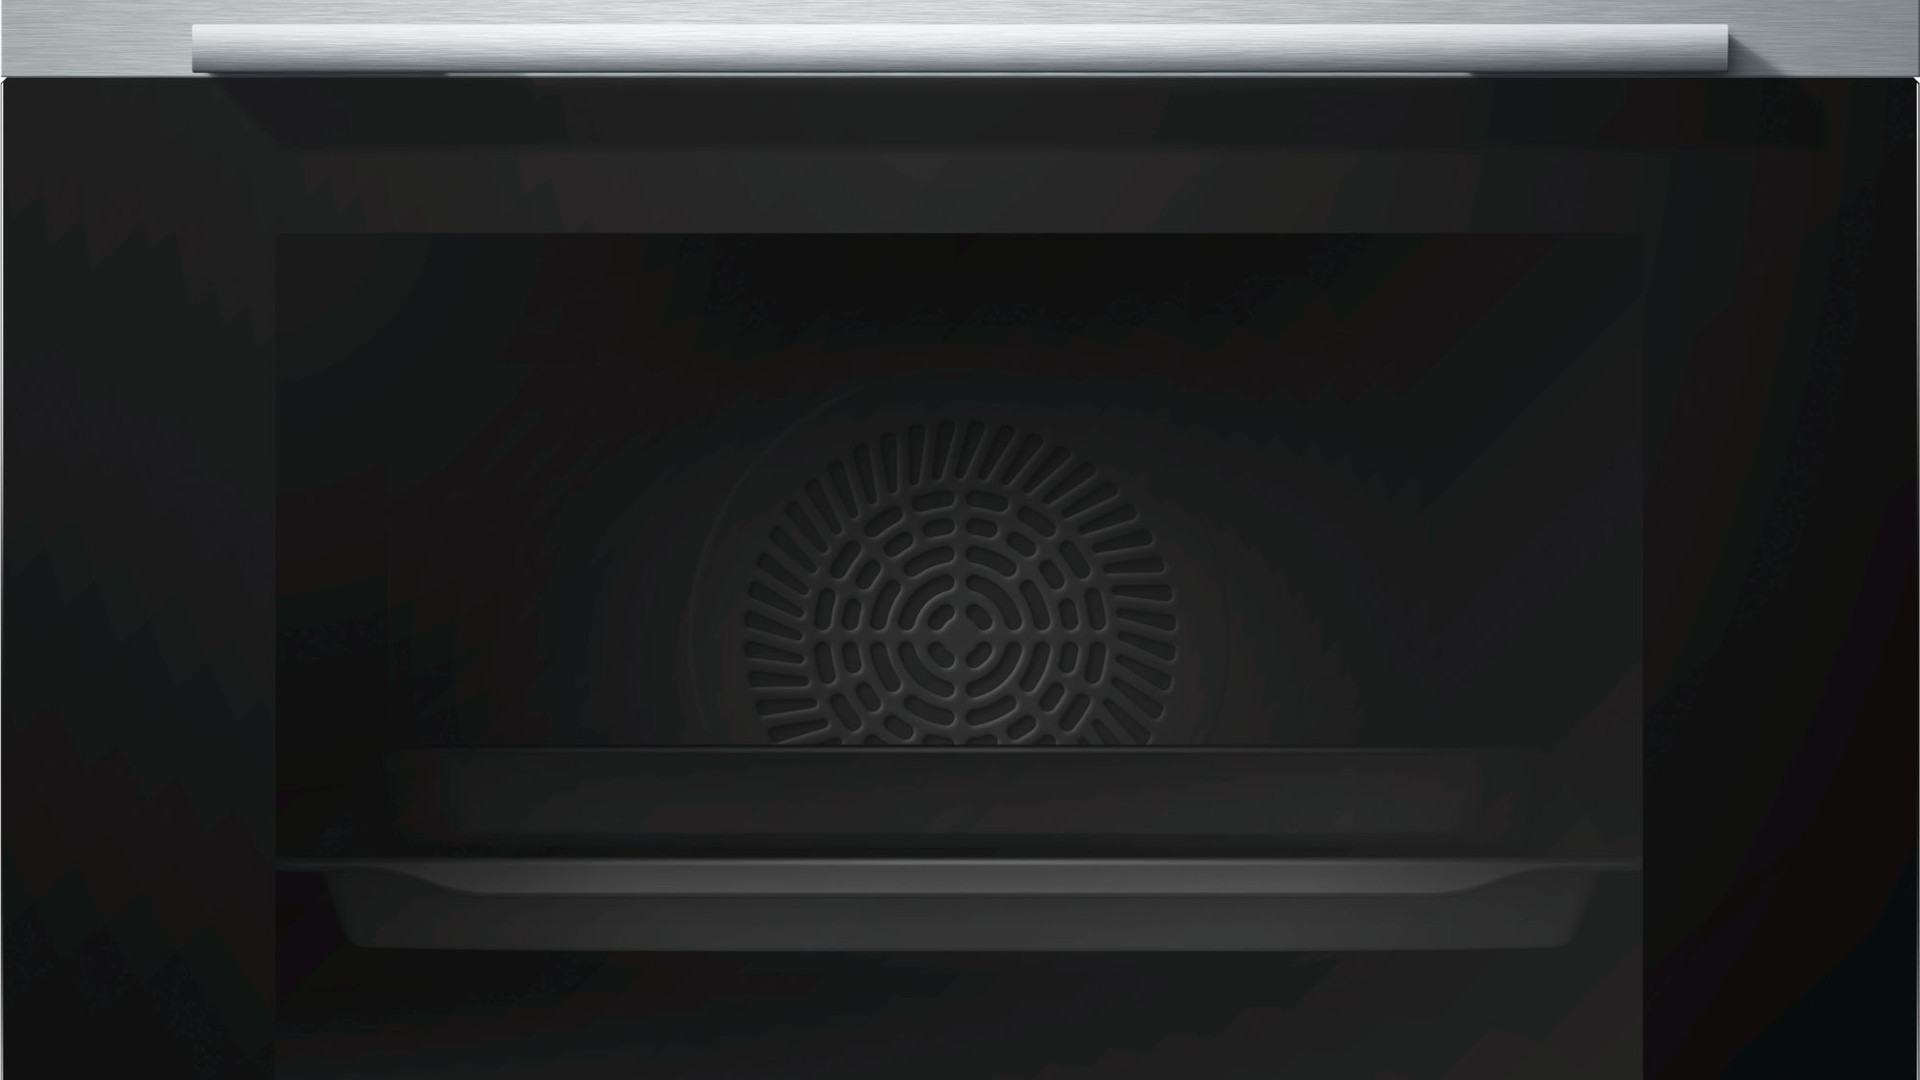 Siemens StudioLine Compact45 Steam Oven